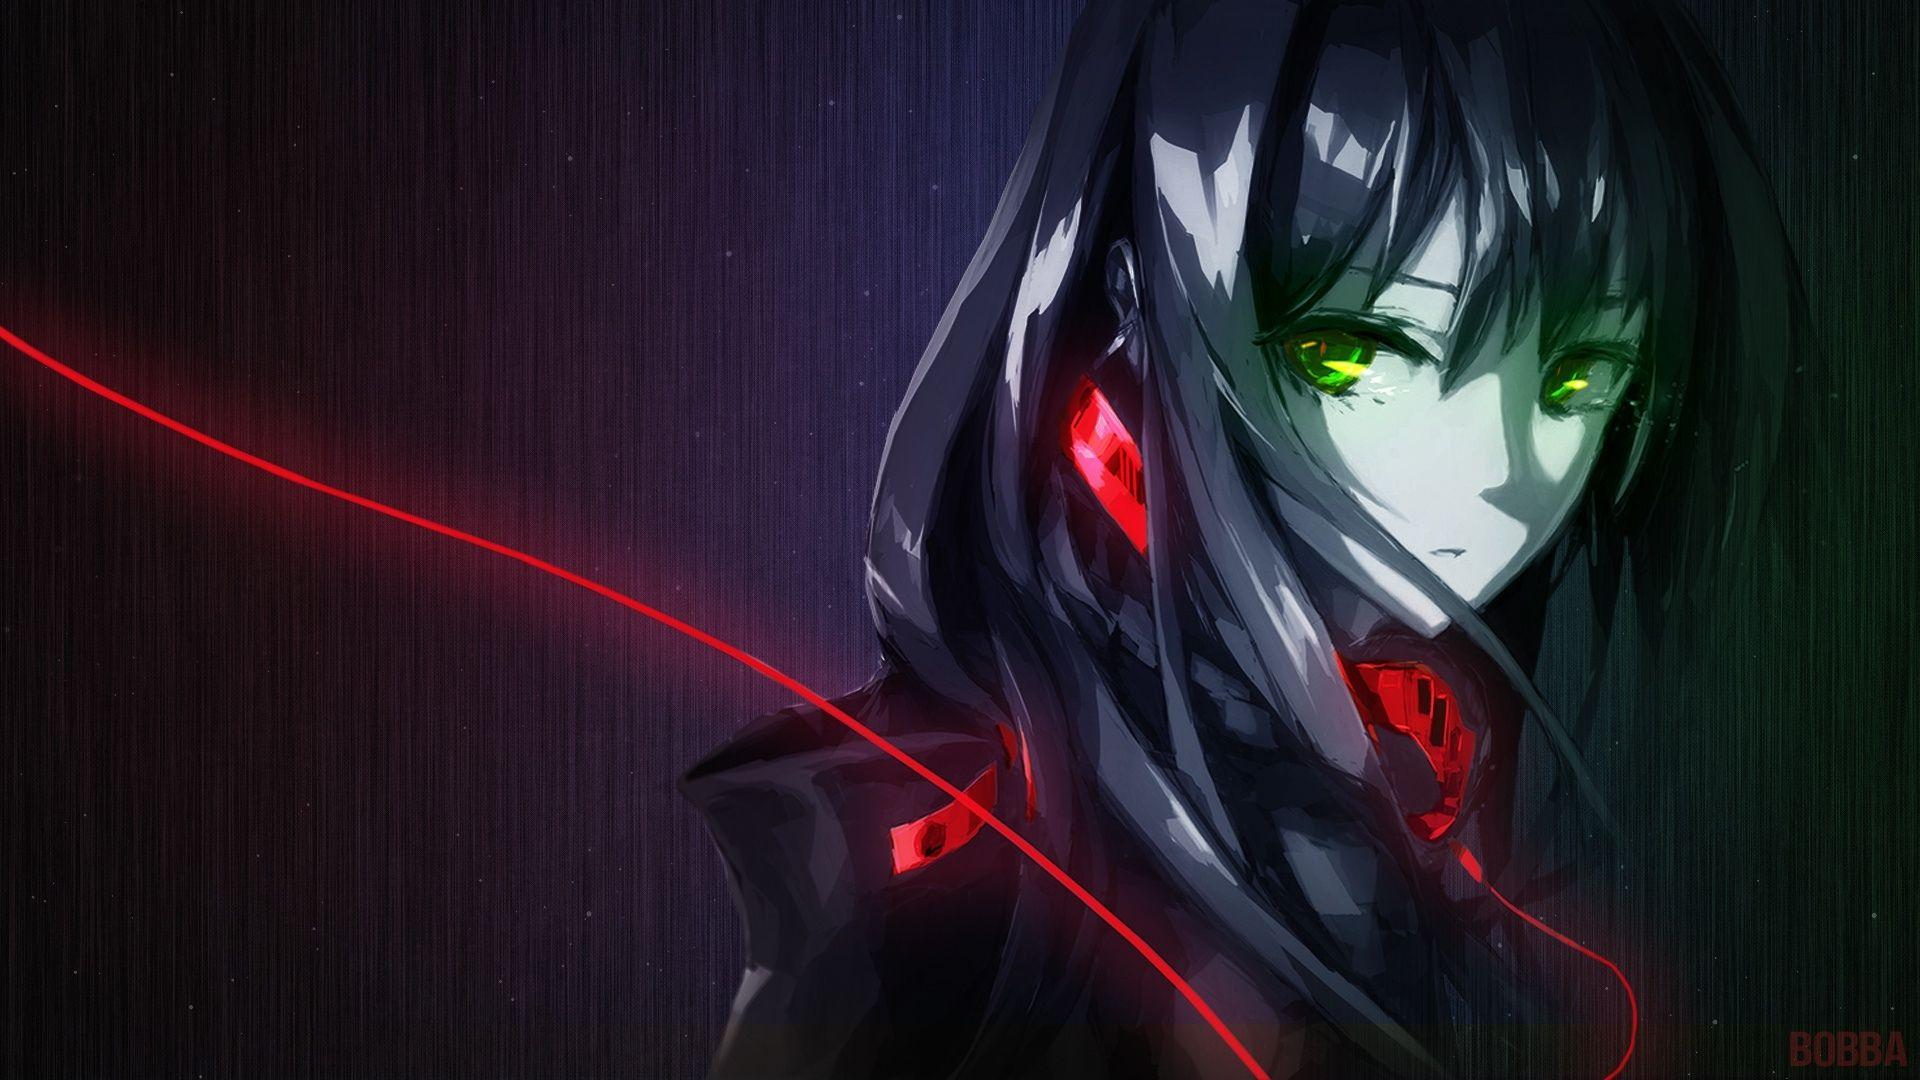 Anime The Idolm Ster Cinderella Girls Black Hair Green Eyes Face